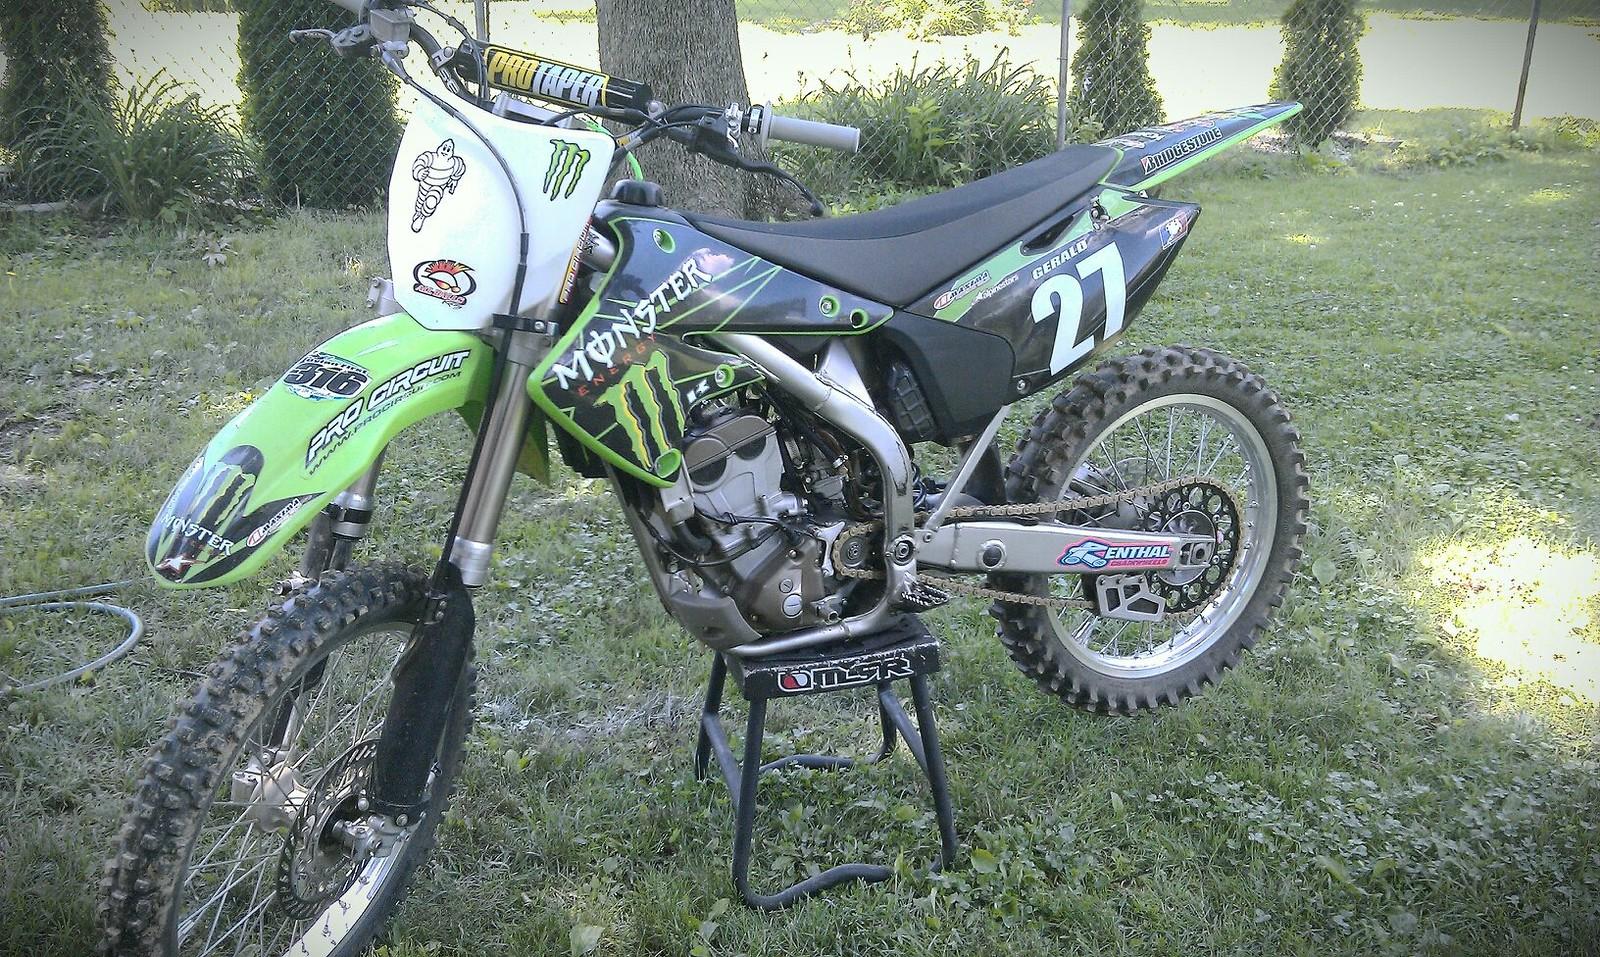 kx250f - PK27RACING - Motocross Pictures - Vital MX